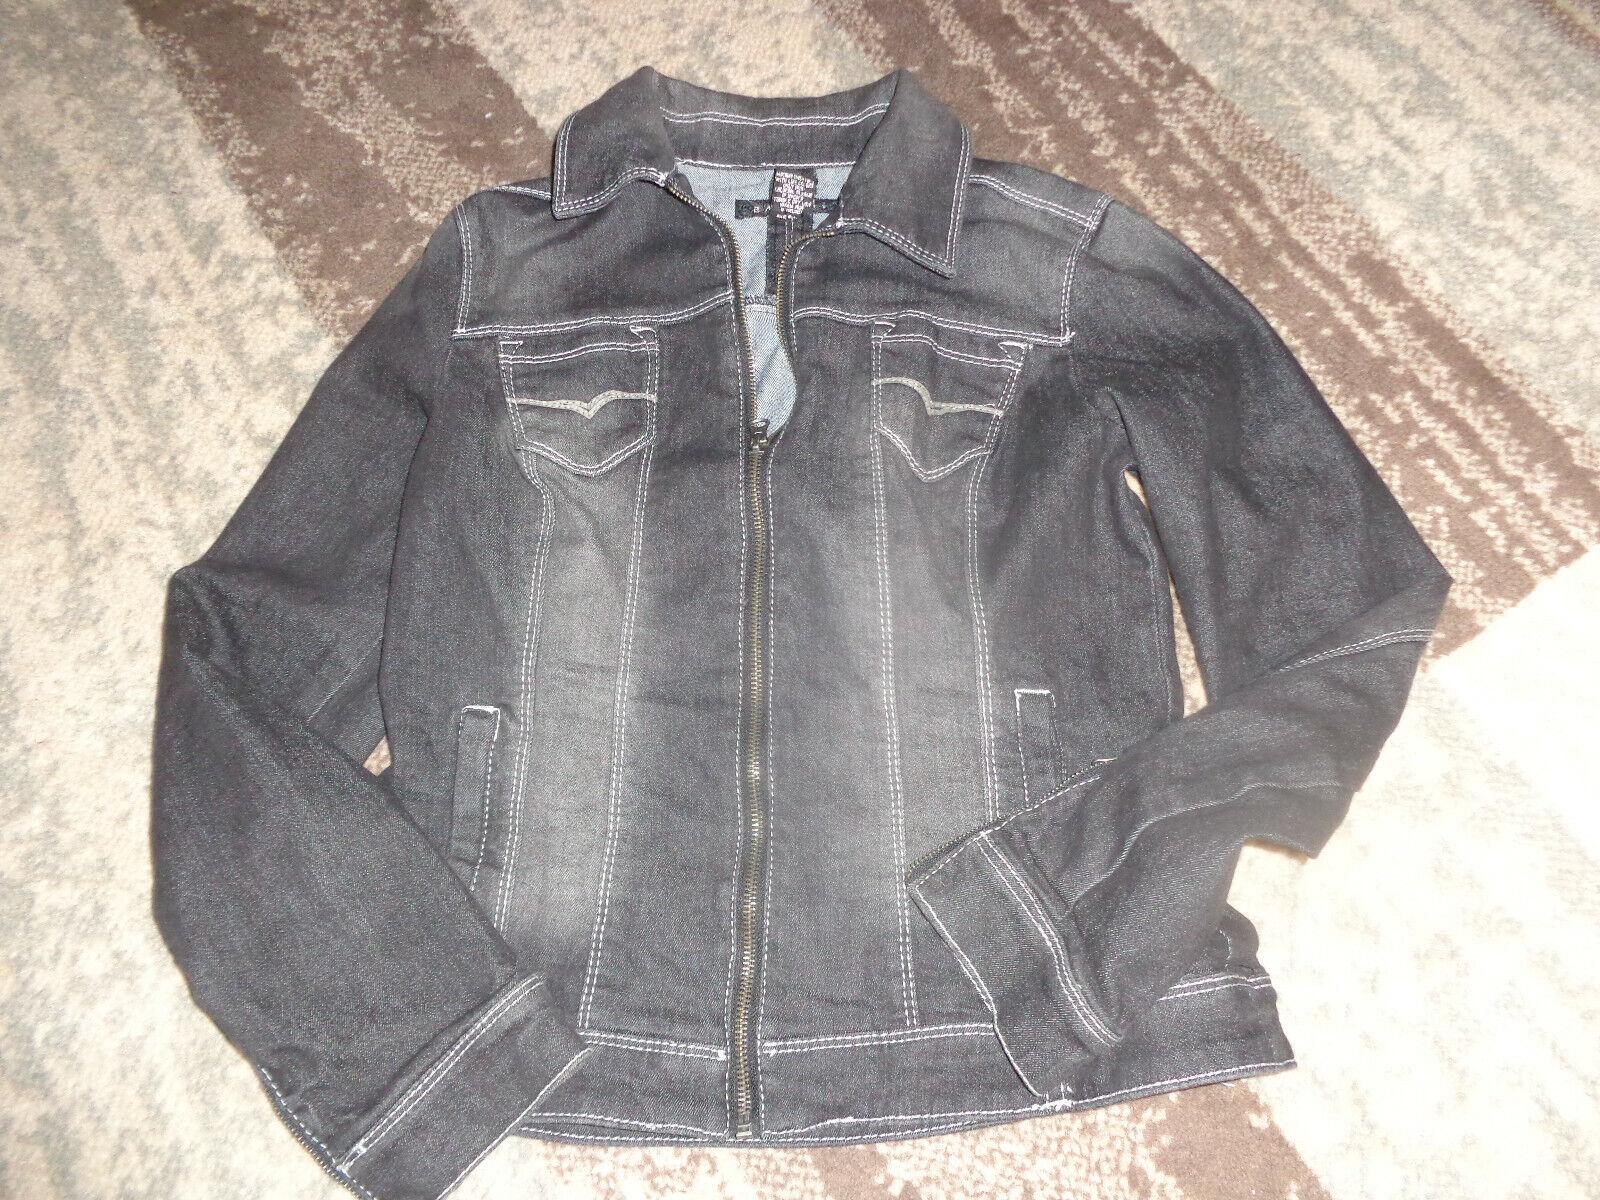 women's jean jacket (black w/white stitching and zippers) size S Baccini EUC